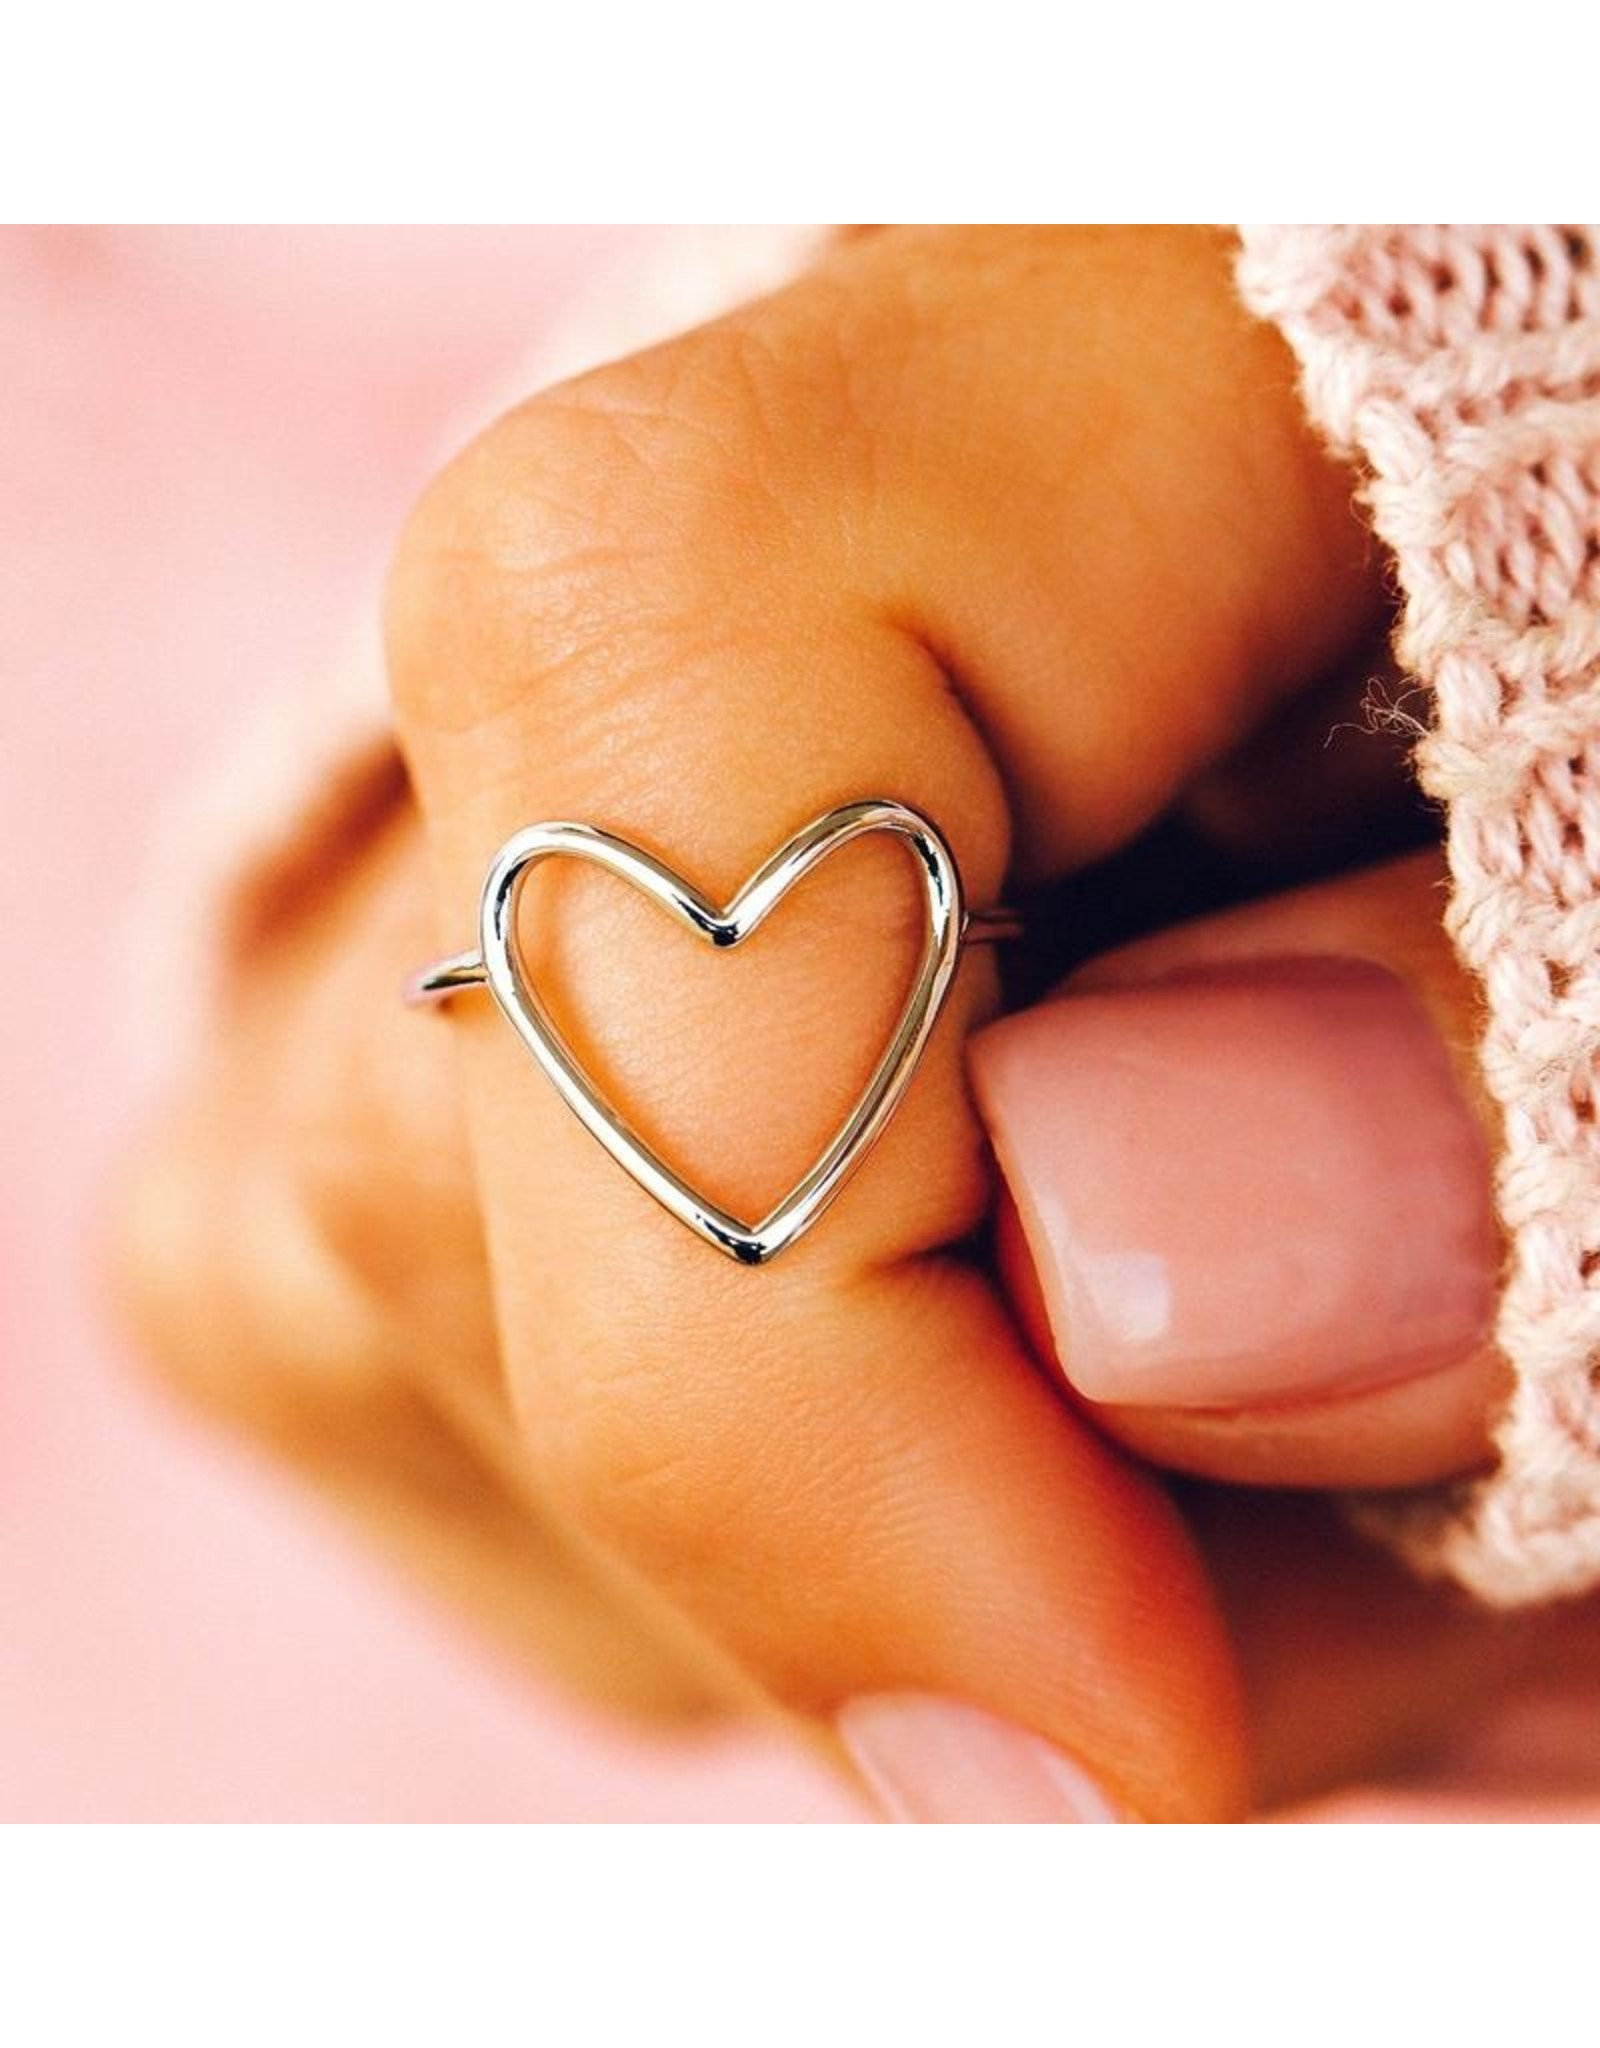 Pura Vida Big Heart Band Ring, Silver Pura Vida